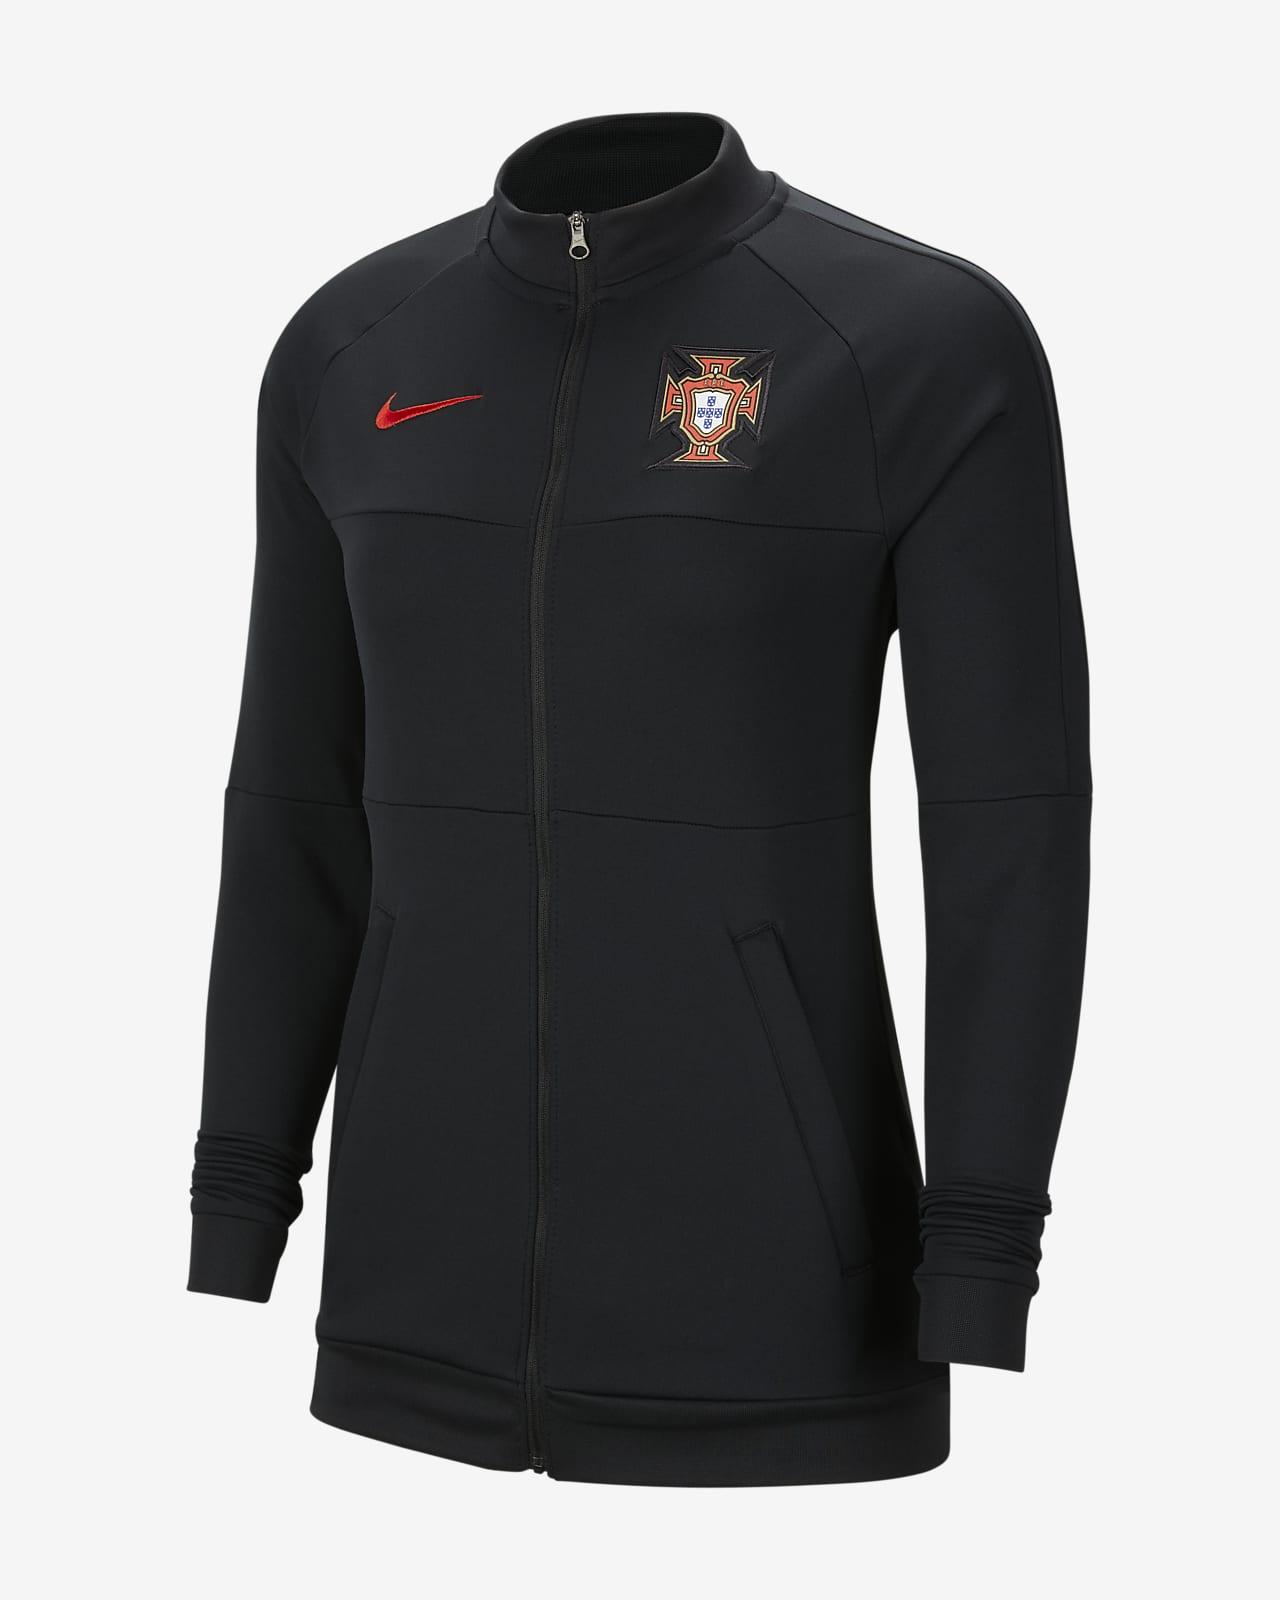 Portugal Women's Football Jacket